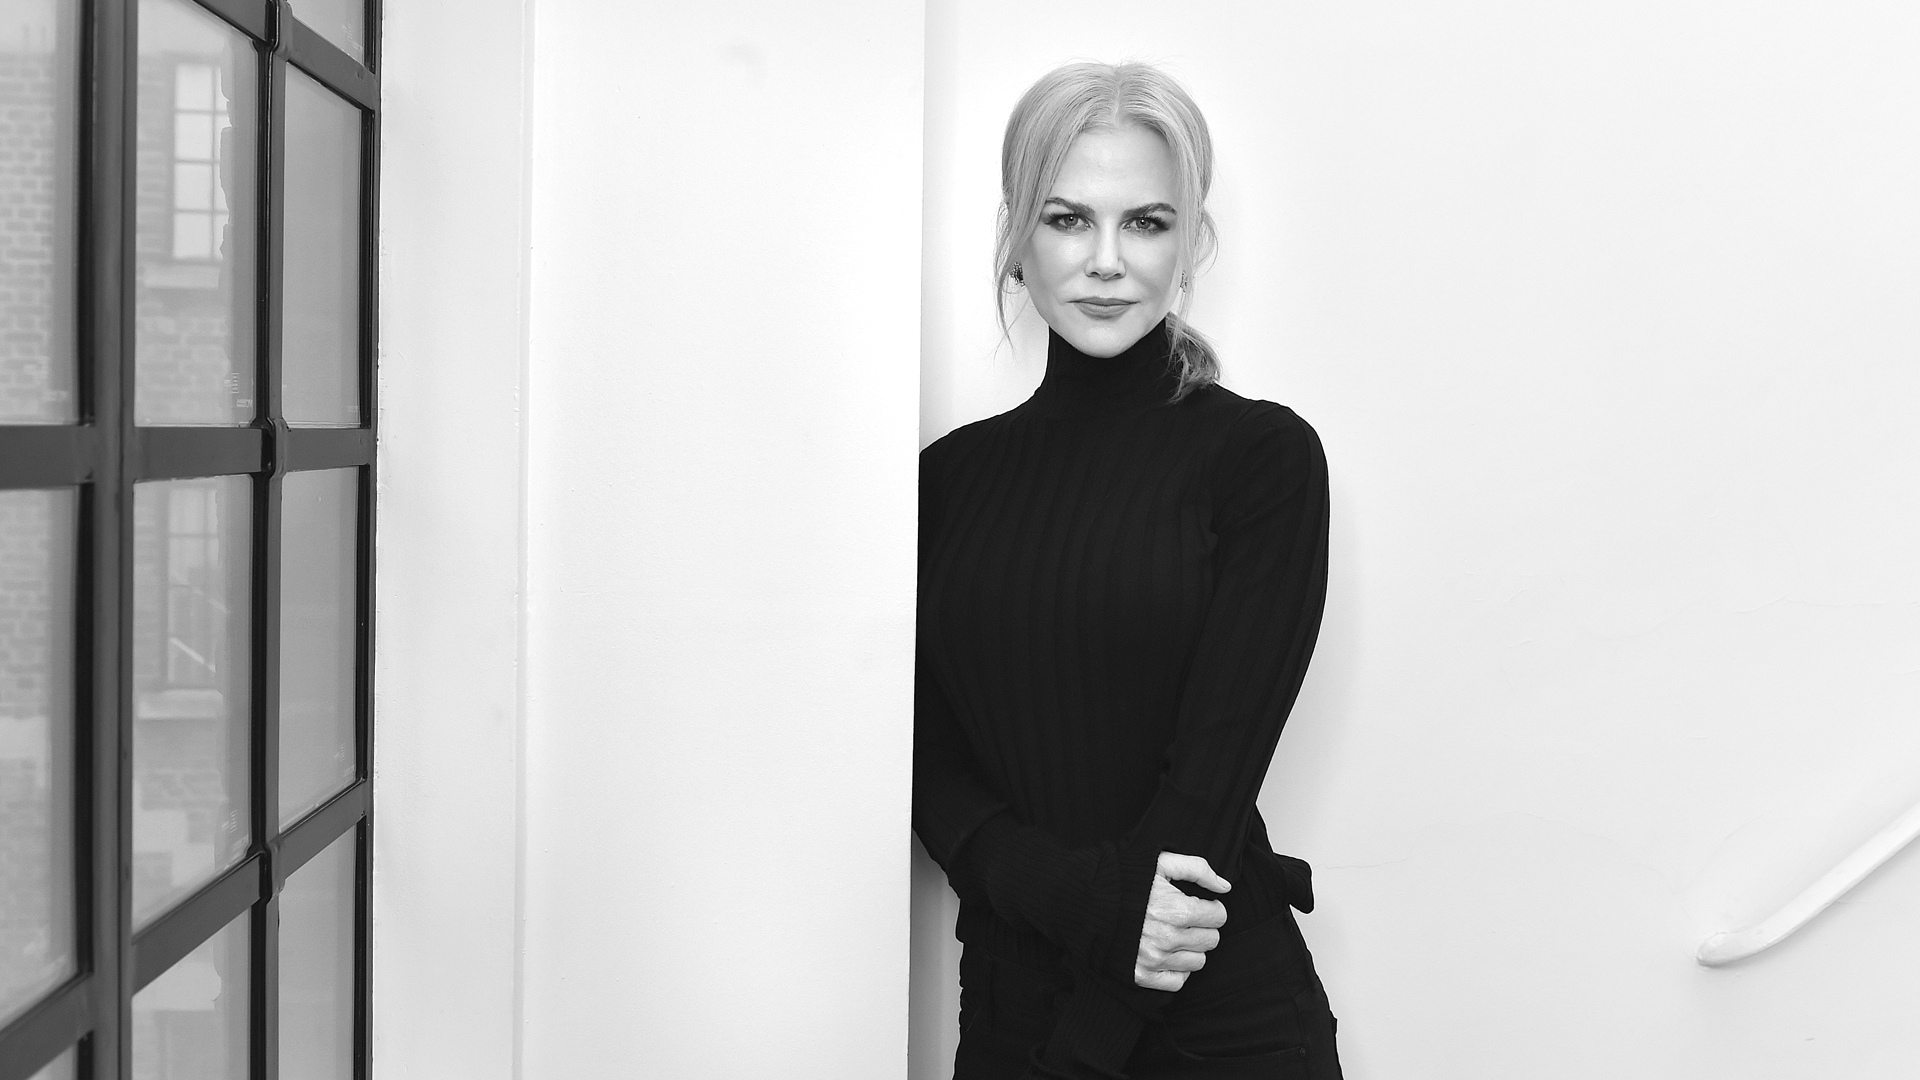 Nicole Kidman at BBC Radio 2, December 2016. Loftus Media Photographer: Sarah Jeynes. © BBC.